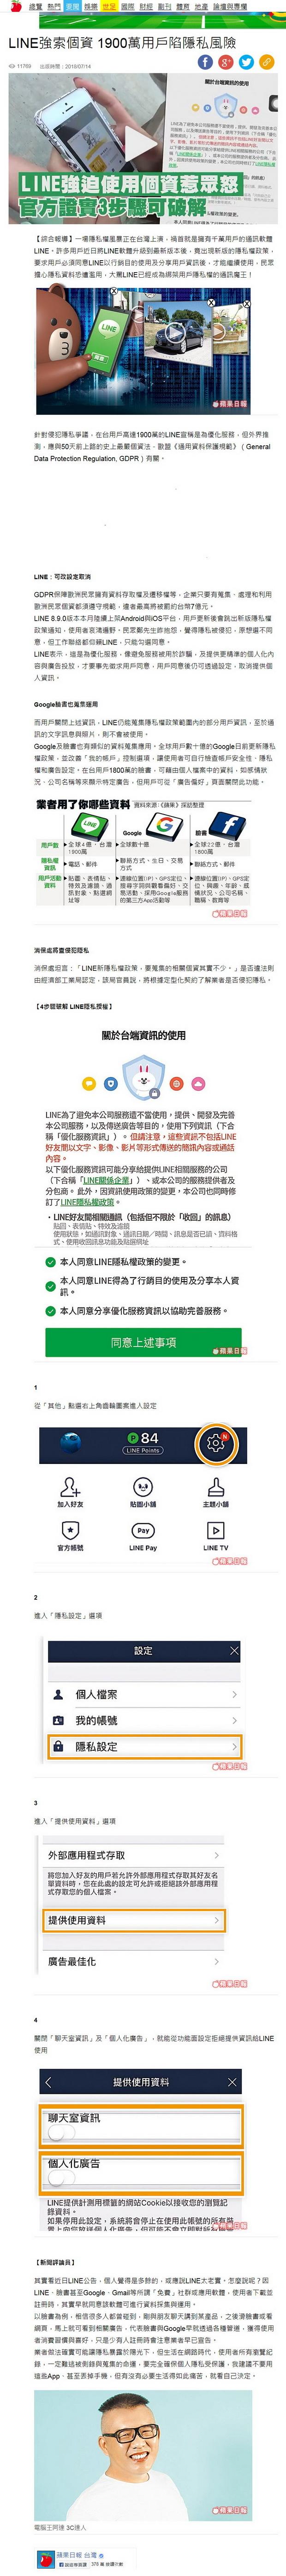 LINE強索個資 1900萬用戶陷隱私風險-2018.07.14.jpg